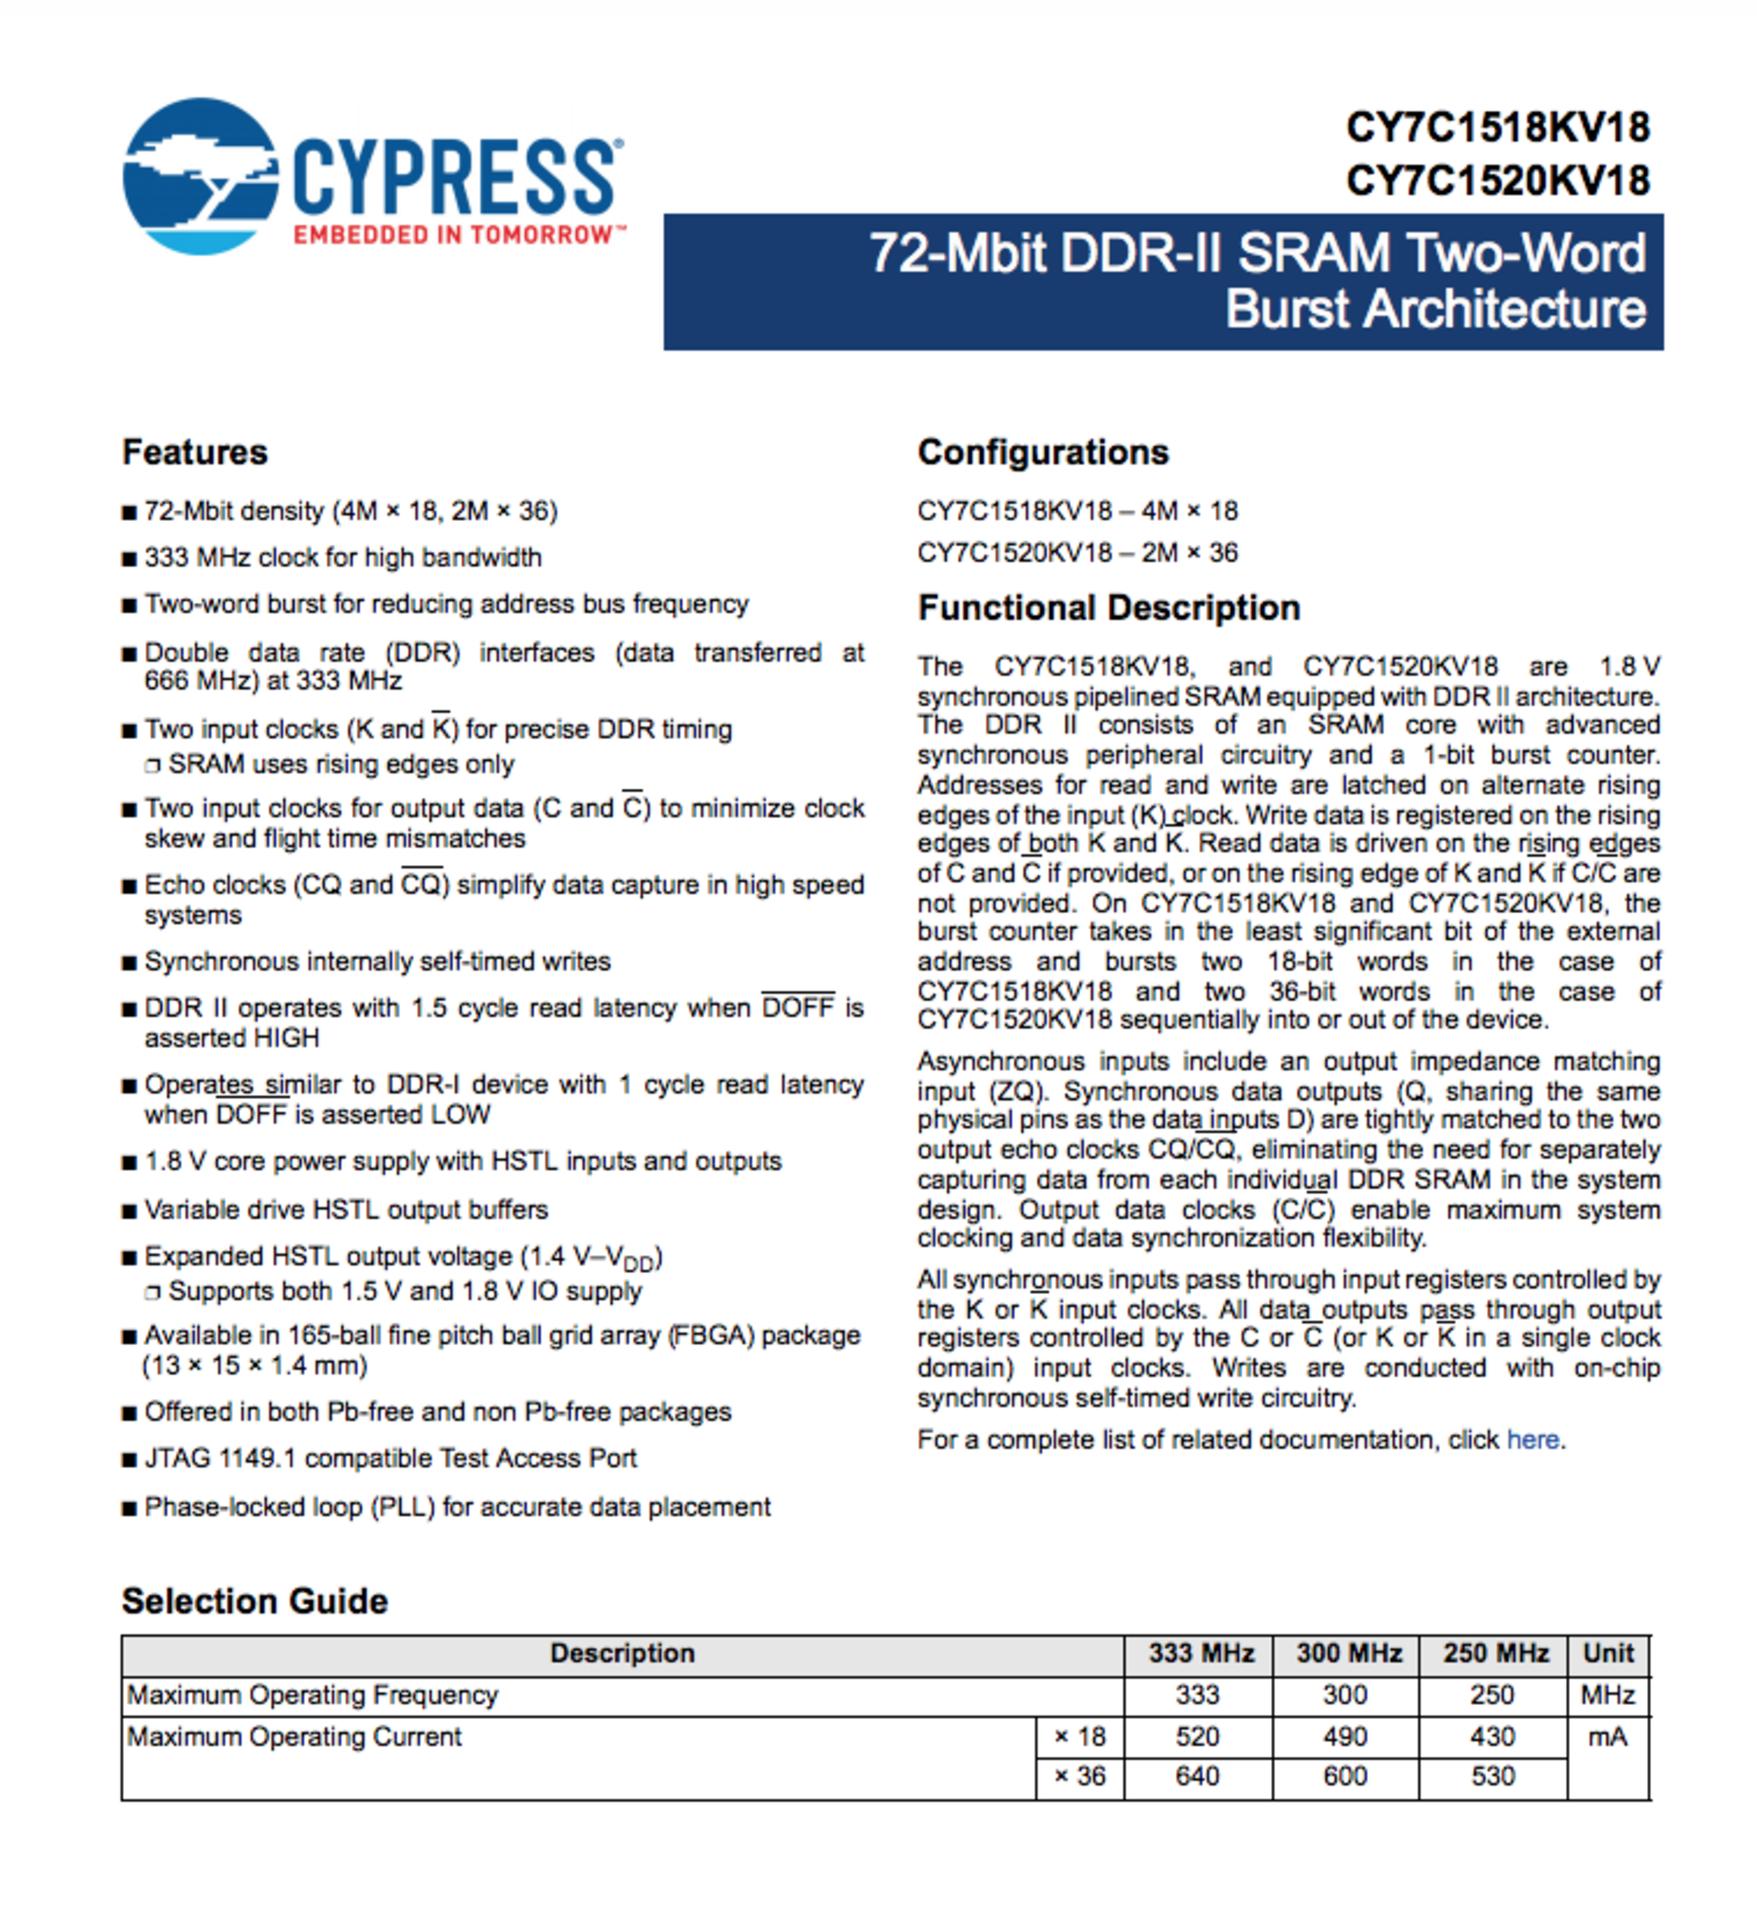 Cypress CY7C1520KV18-300BZXI, SRAM Chip Sync Single 1.8V 72M-bit 2M x 36 0.45ns - Image 4 of 5